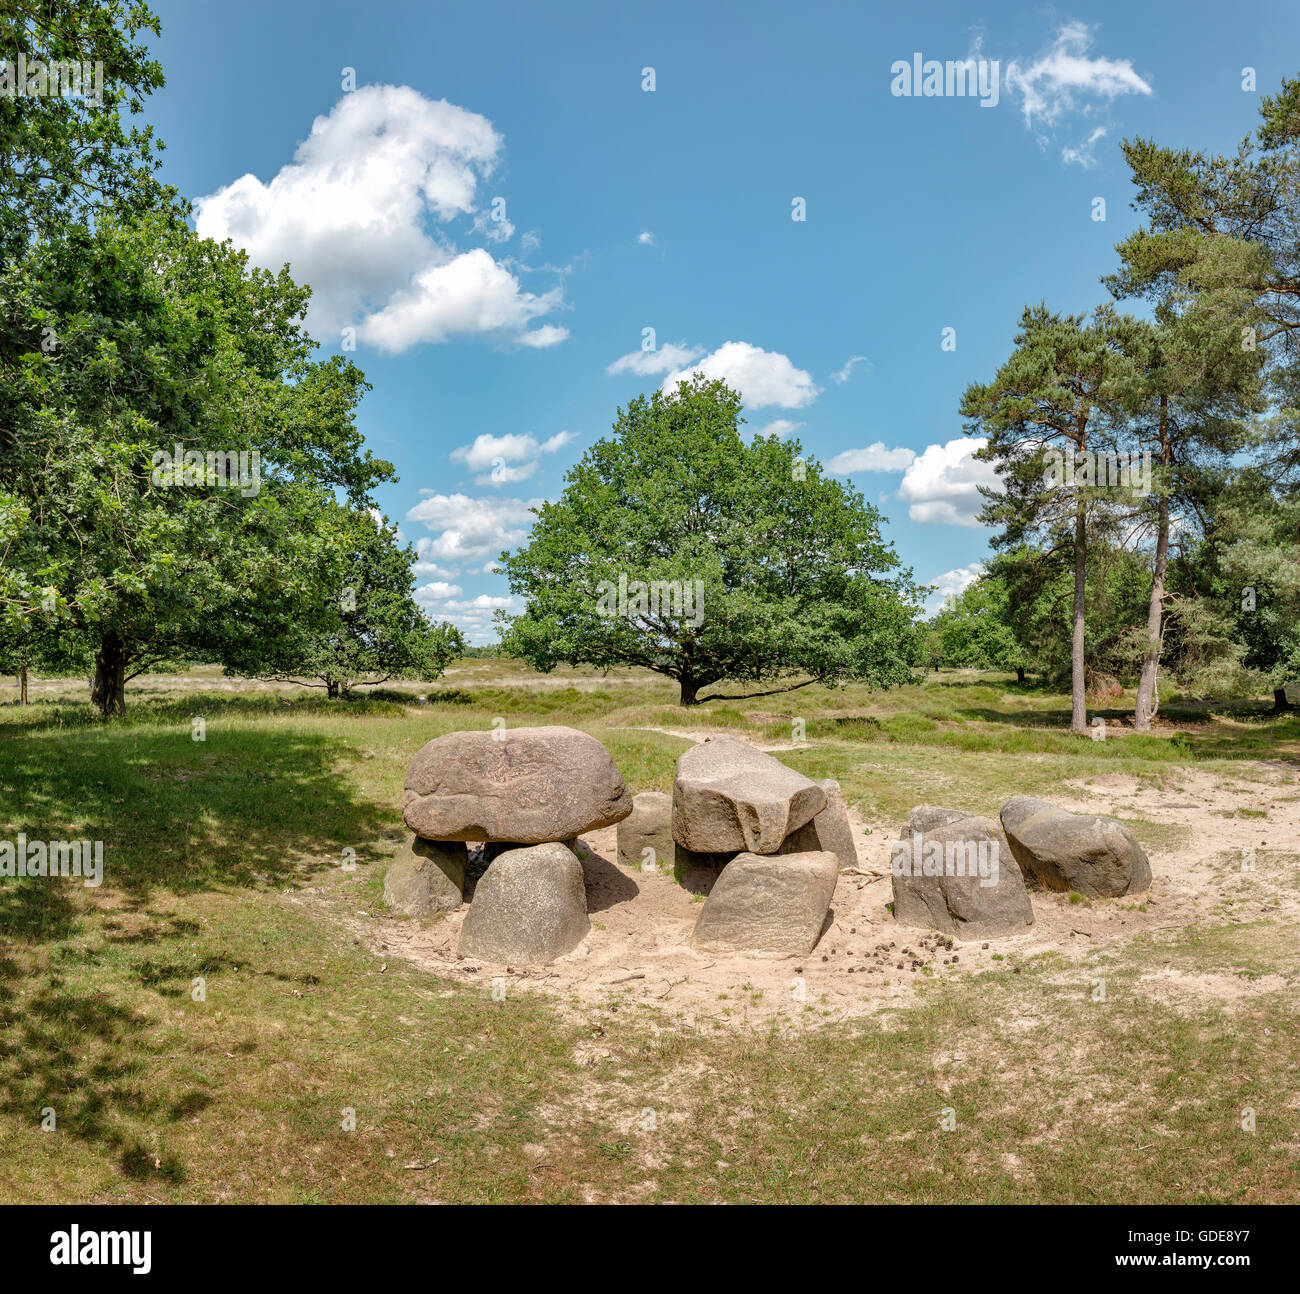 Gasteren,Drenthe,Megalithic grave in the Gasteren Dunes natural area - Stock Image